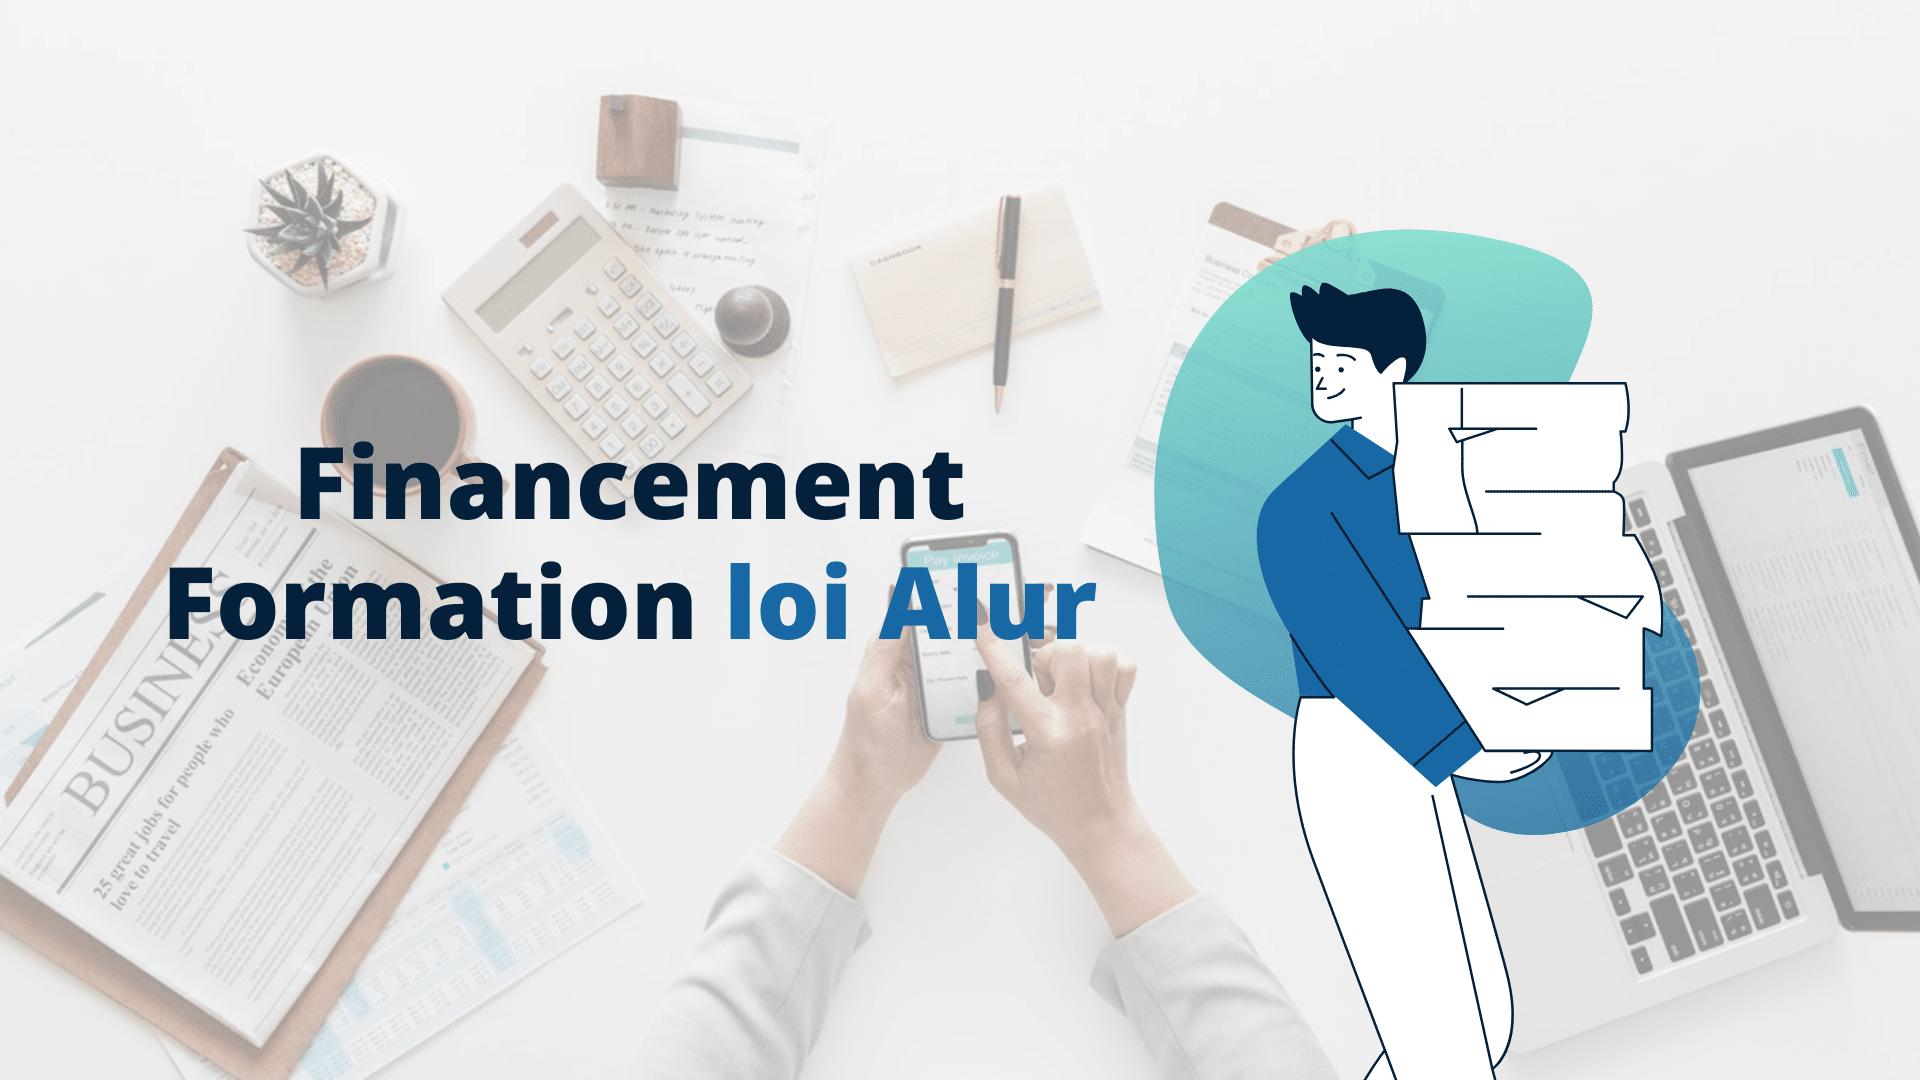 Financement Formation loi Alur